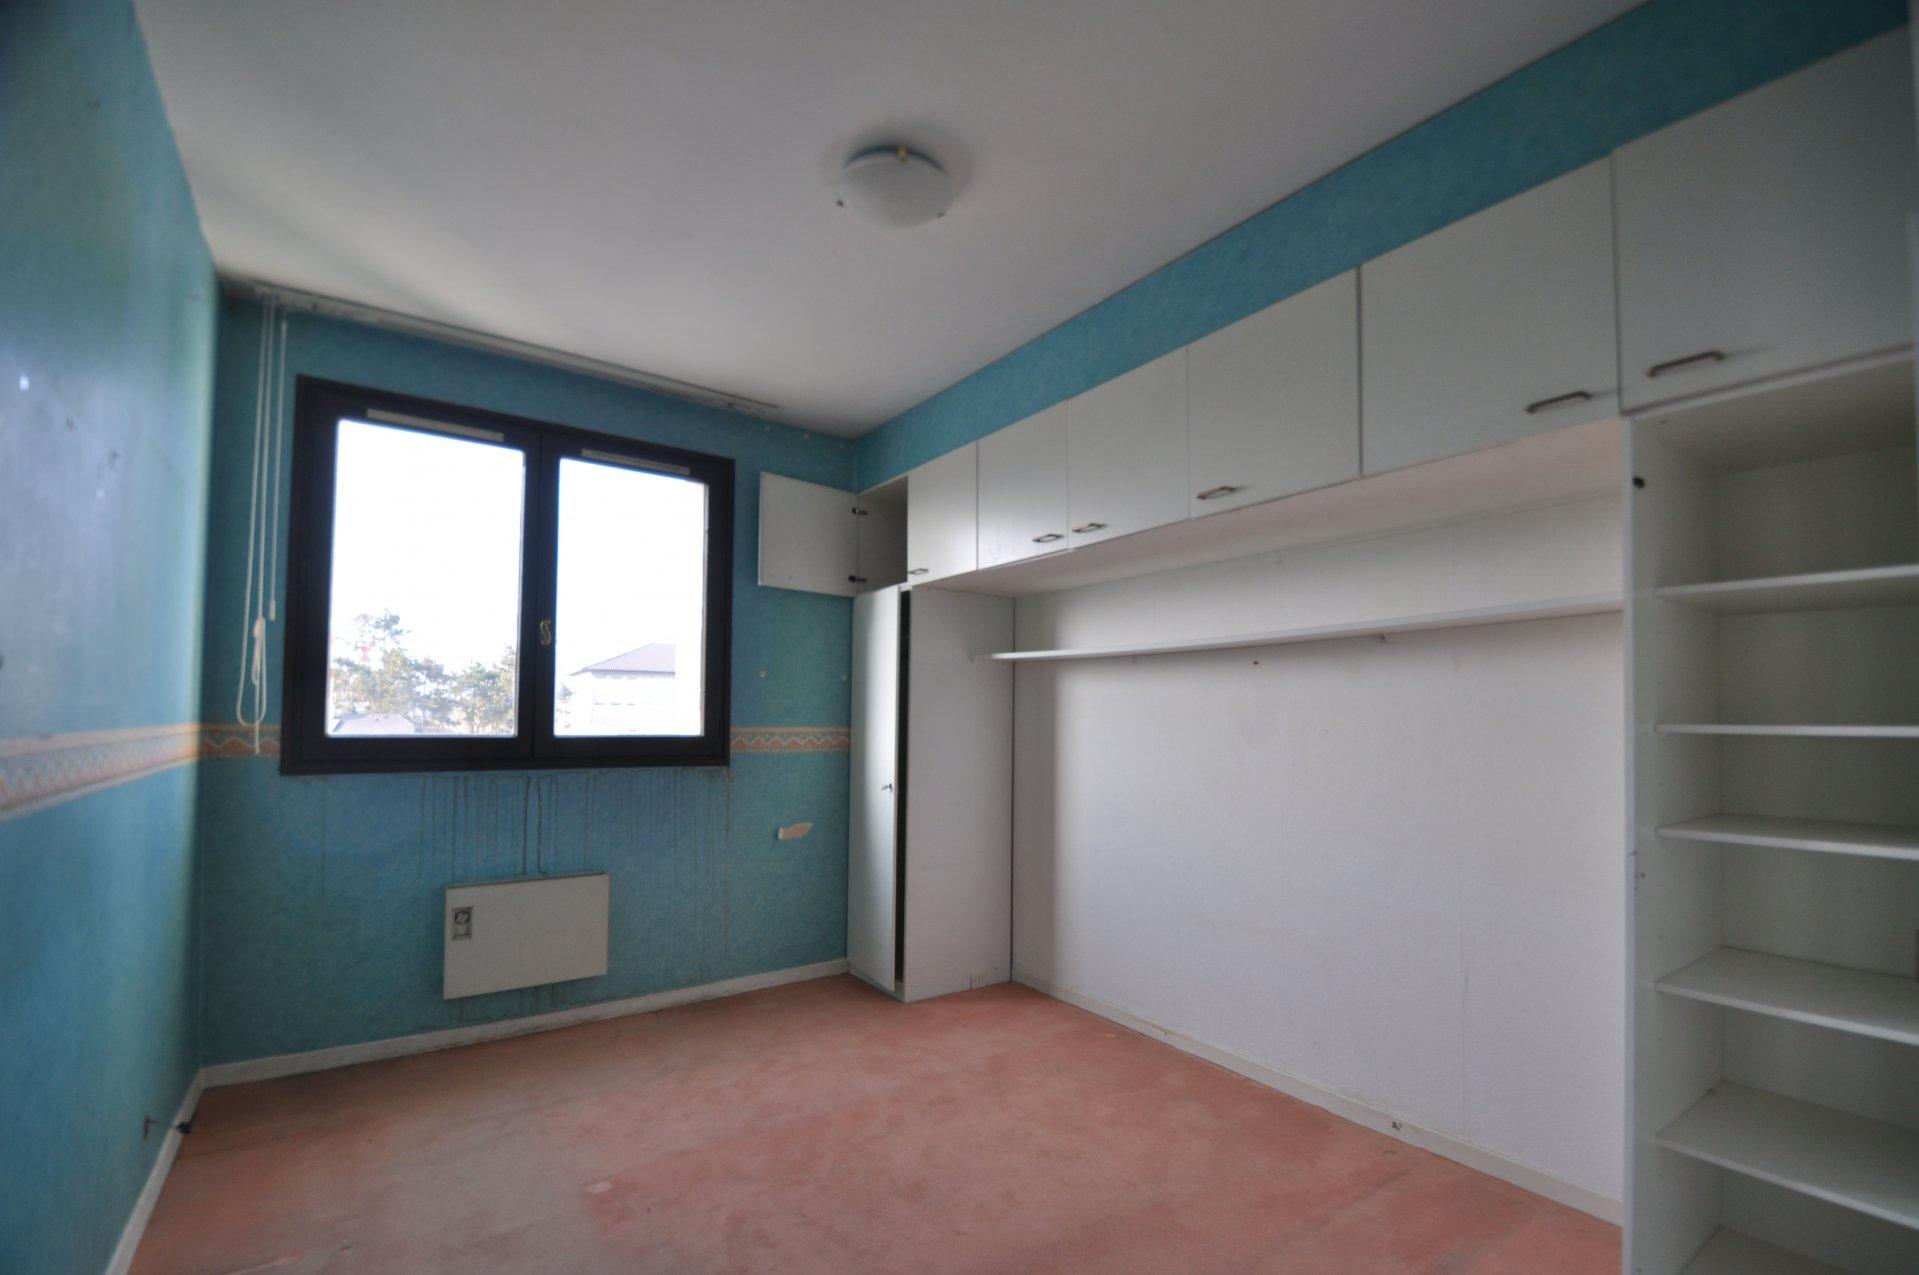 4P - 86 m2 - GARAGE - CAVE